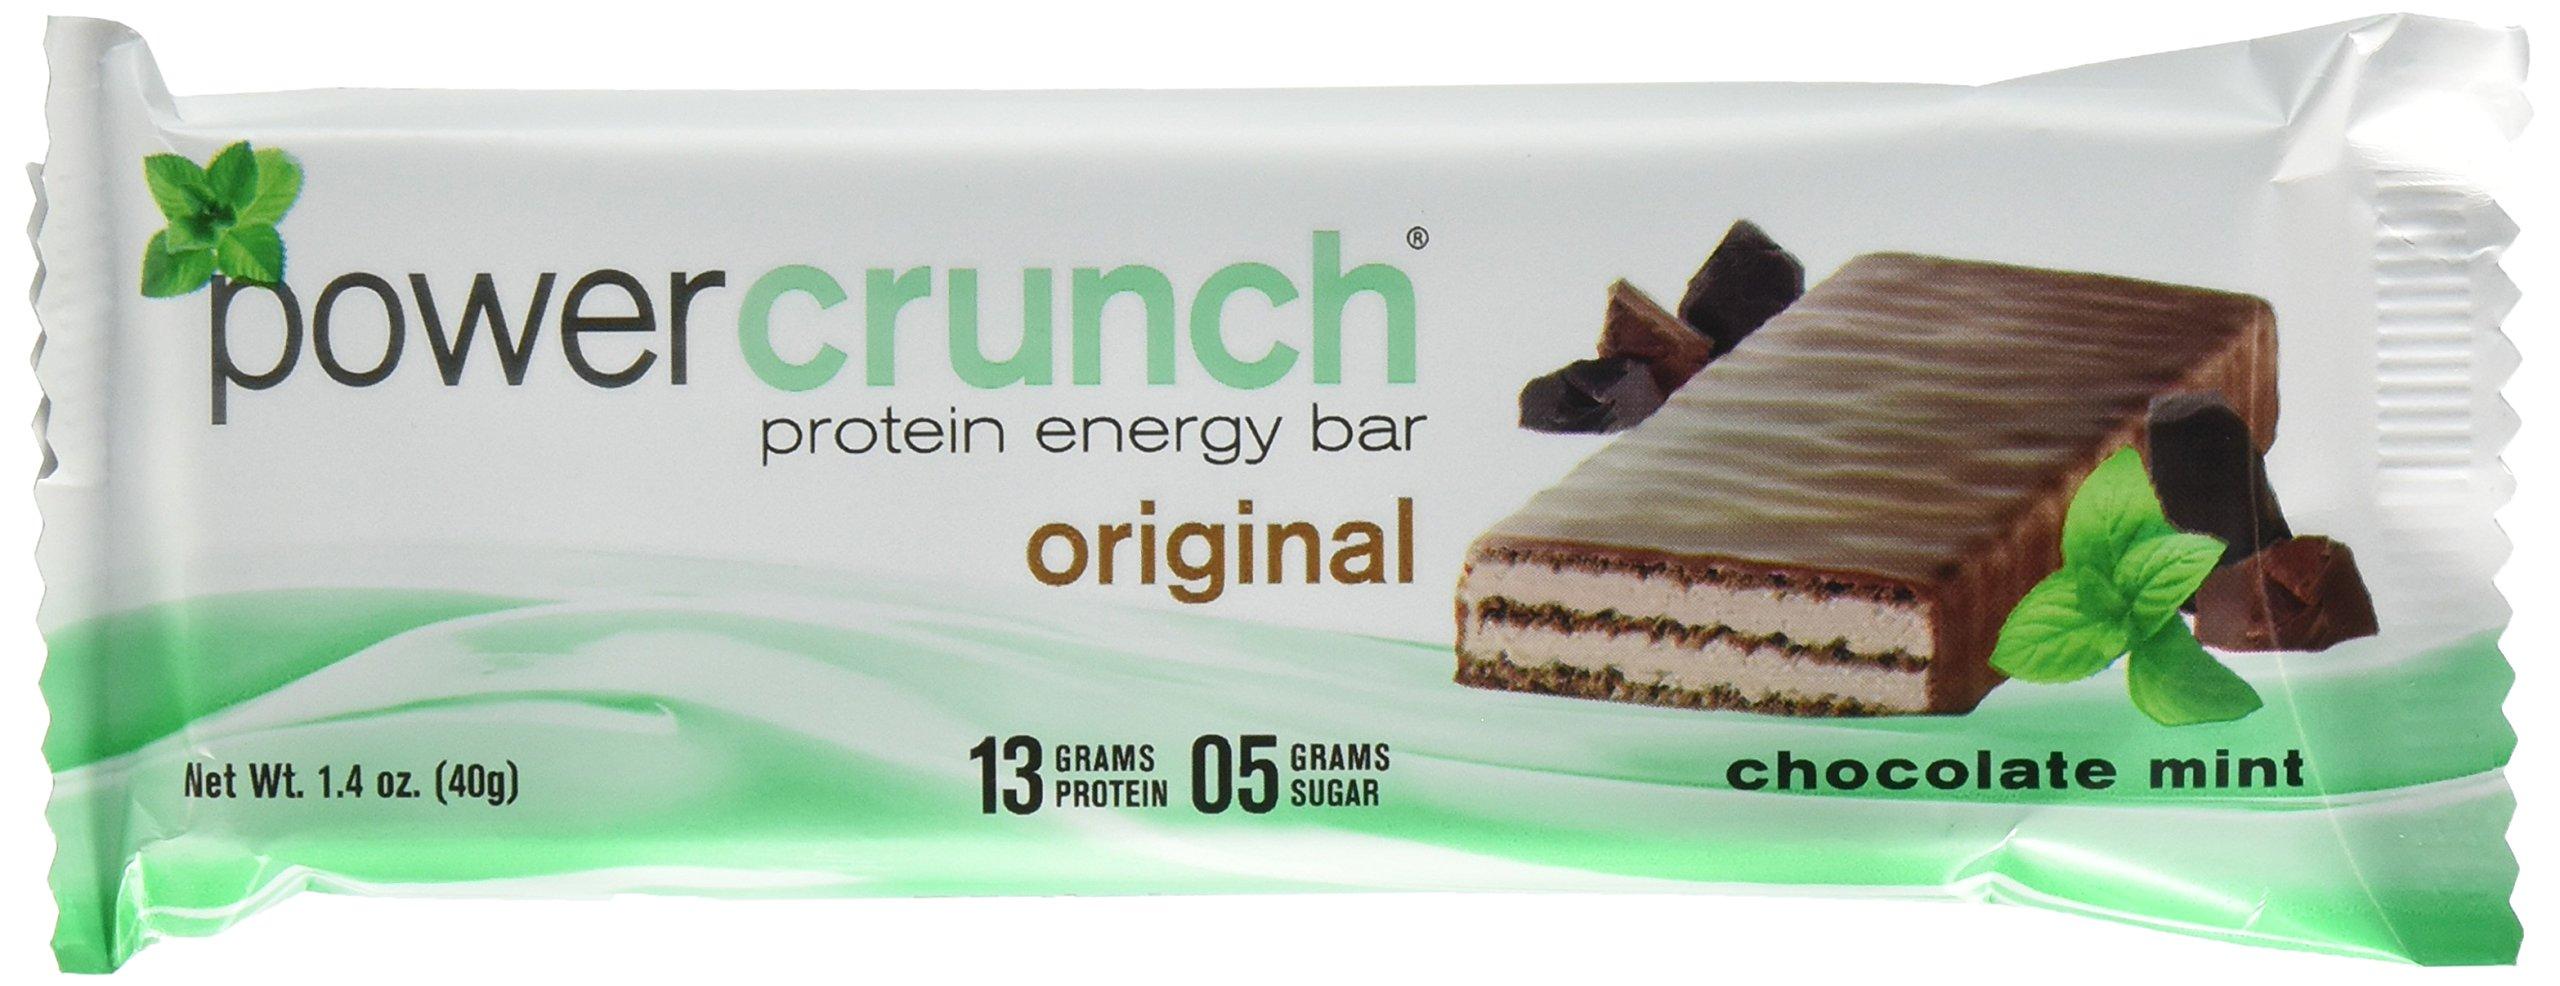 Power Crunch Protein Energy Bar, Chocolate Mint, 1.4-Ounce Bars, 12 Count